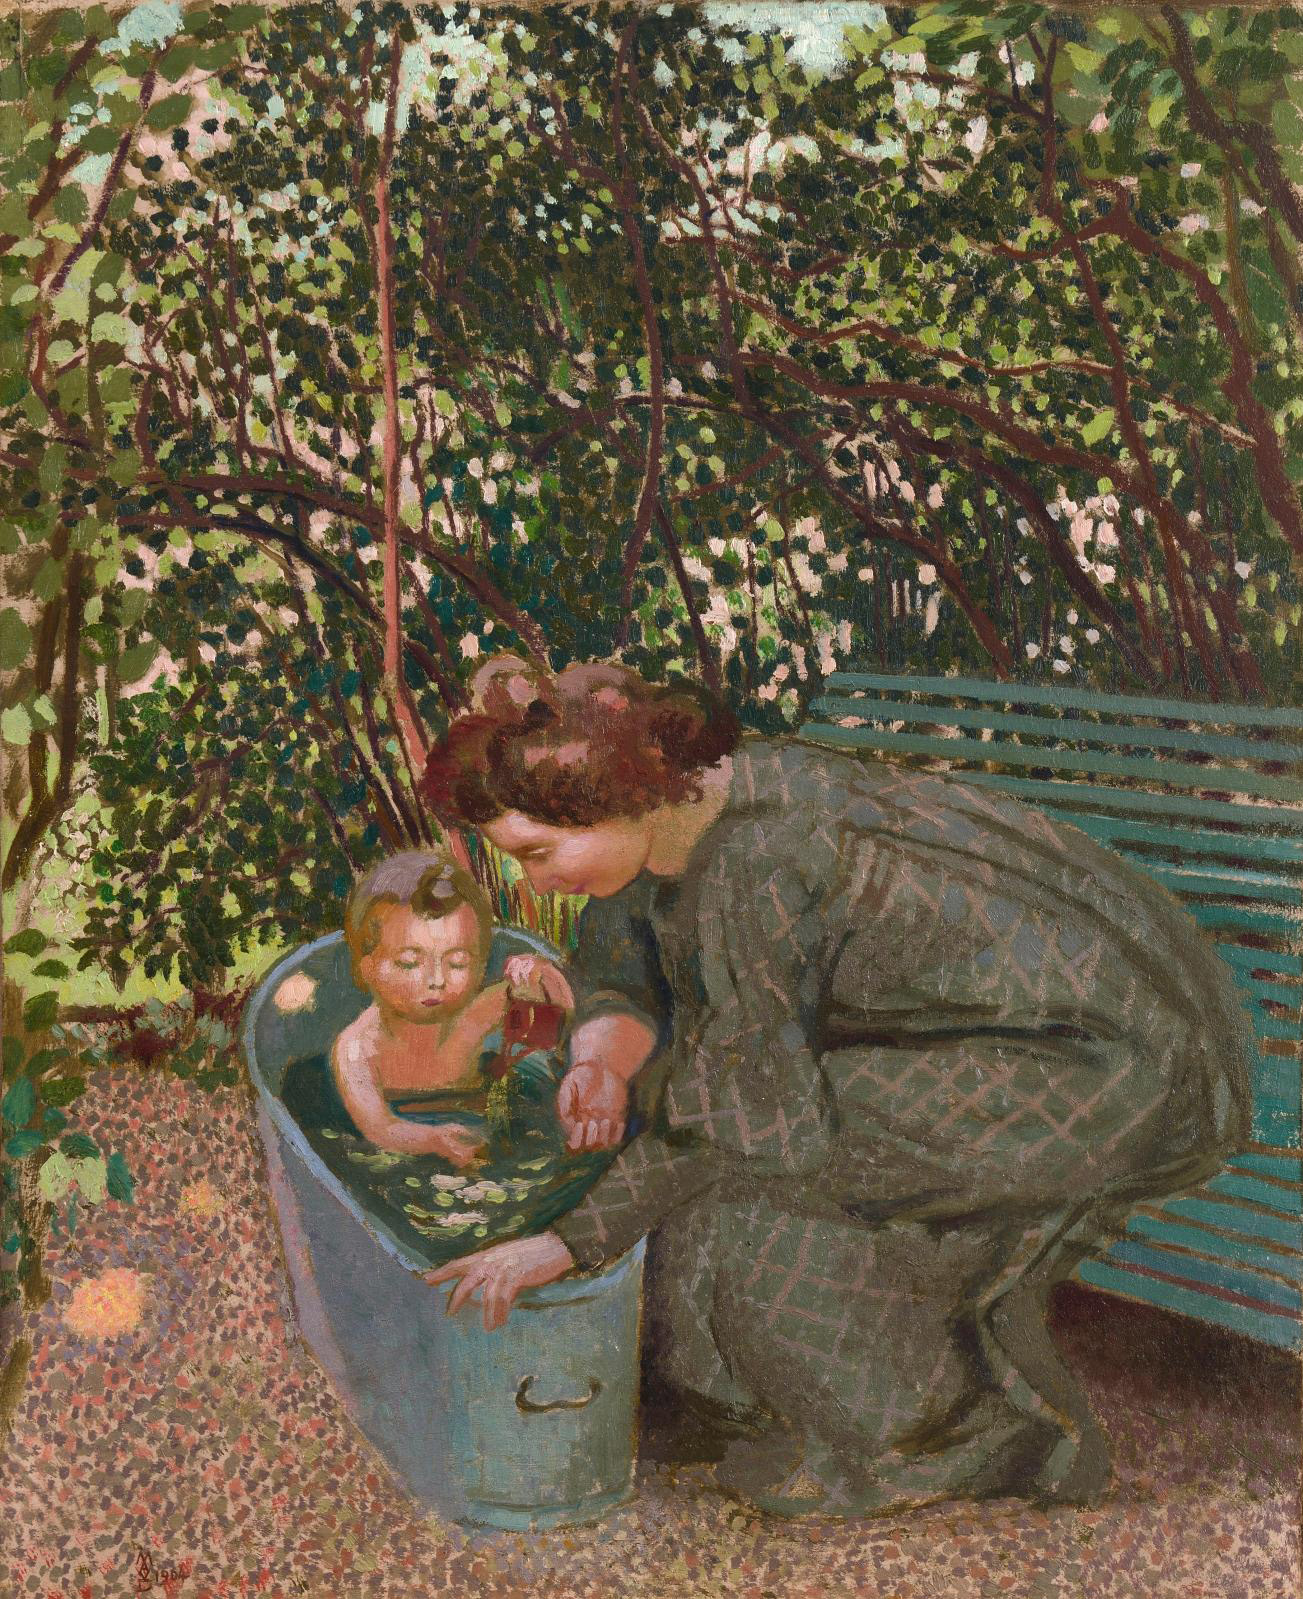 Maurice Denis (1870-1943), Le Bain en plein air (The Outdoor Bath), 1904, private collection, courtesy of the Berès Gallery, Paris. © Galerie Berès